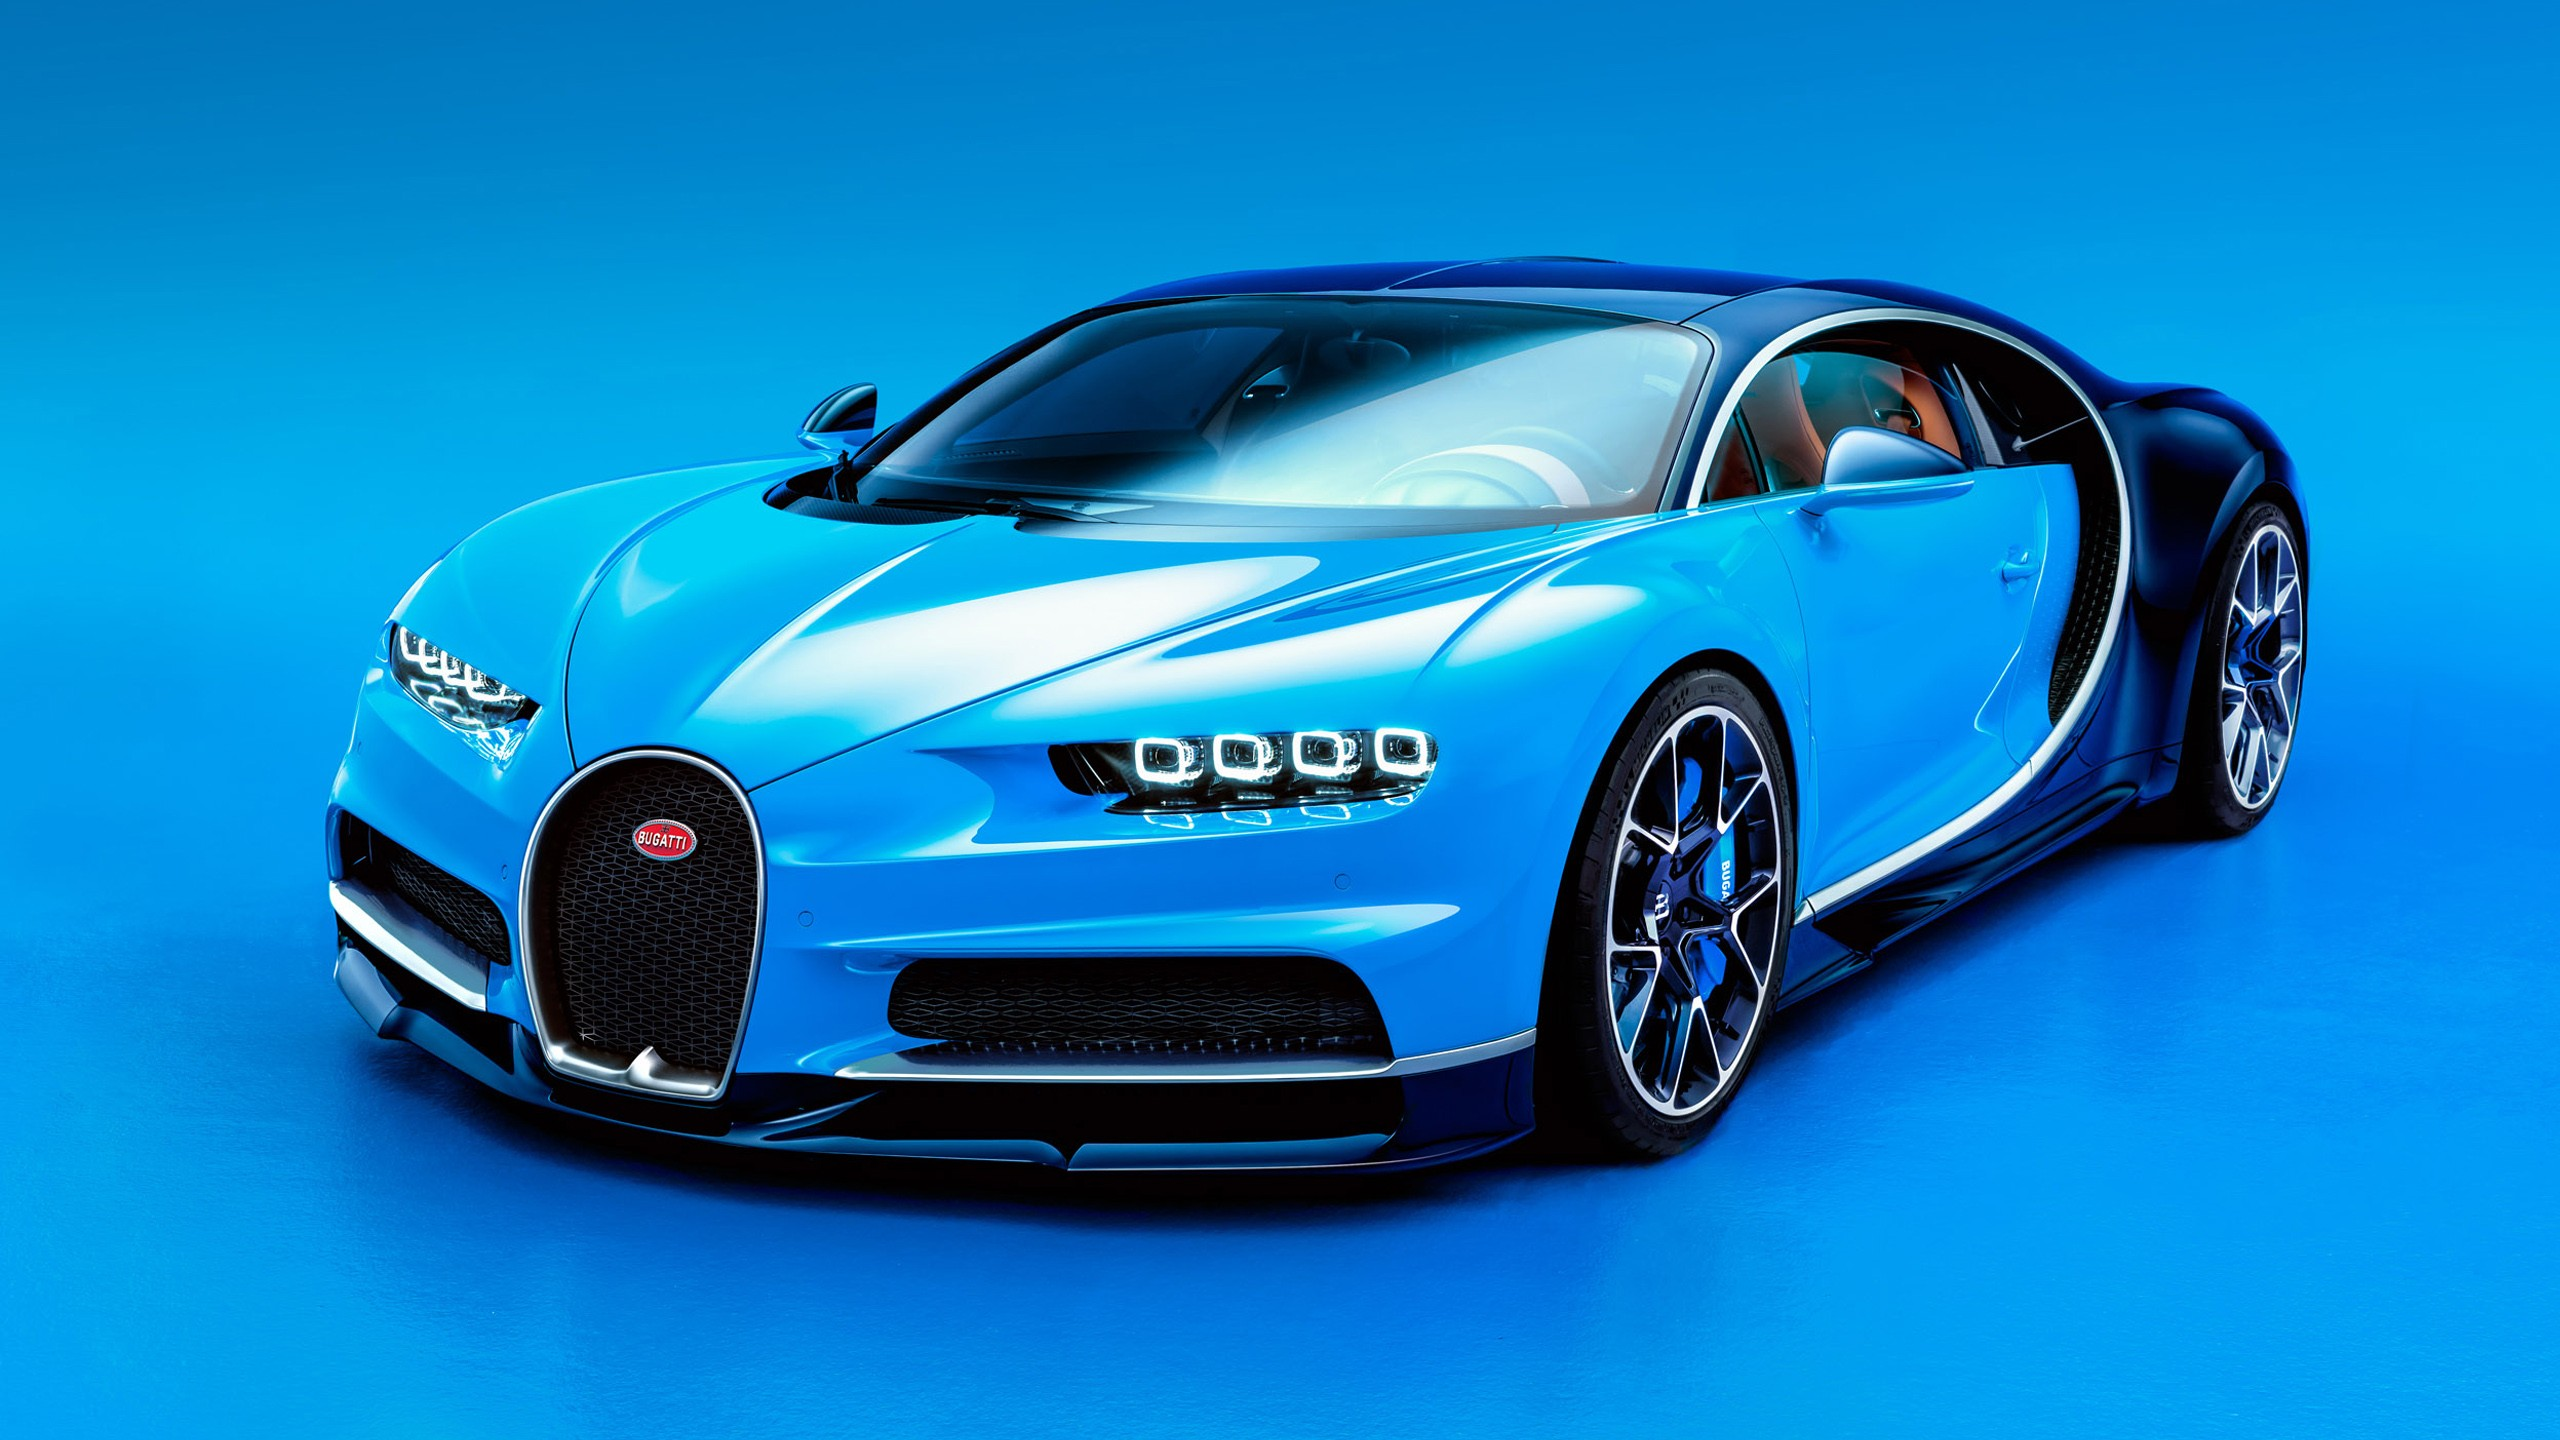 2016 Bugatti Chiron Wallpaper